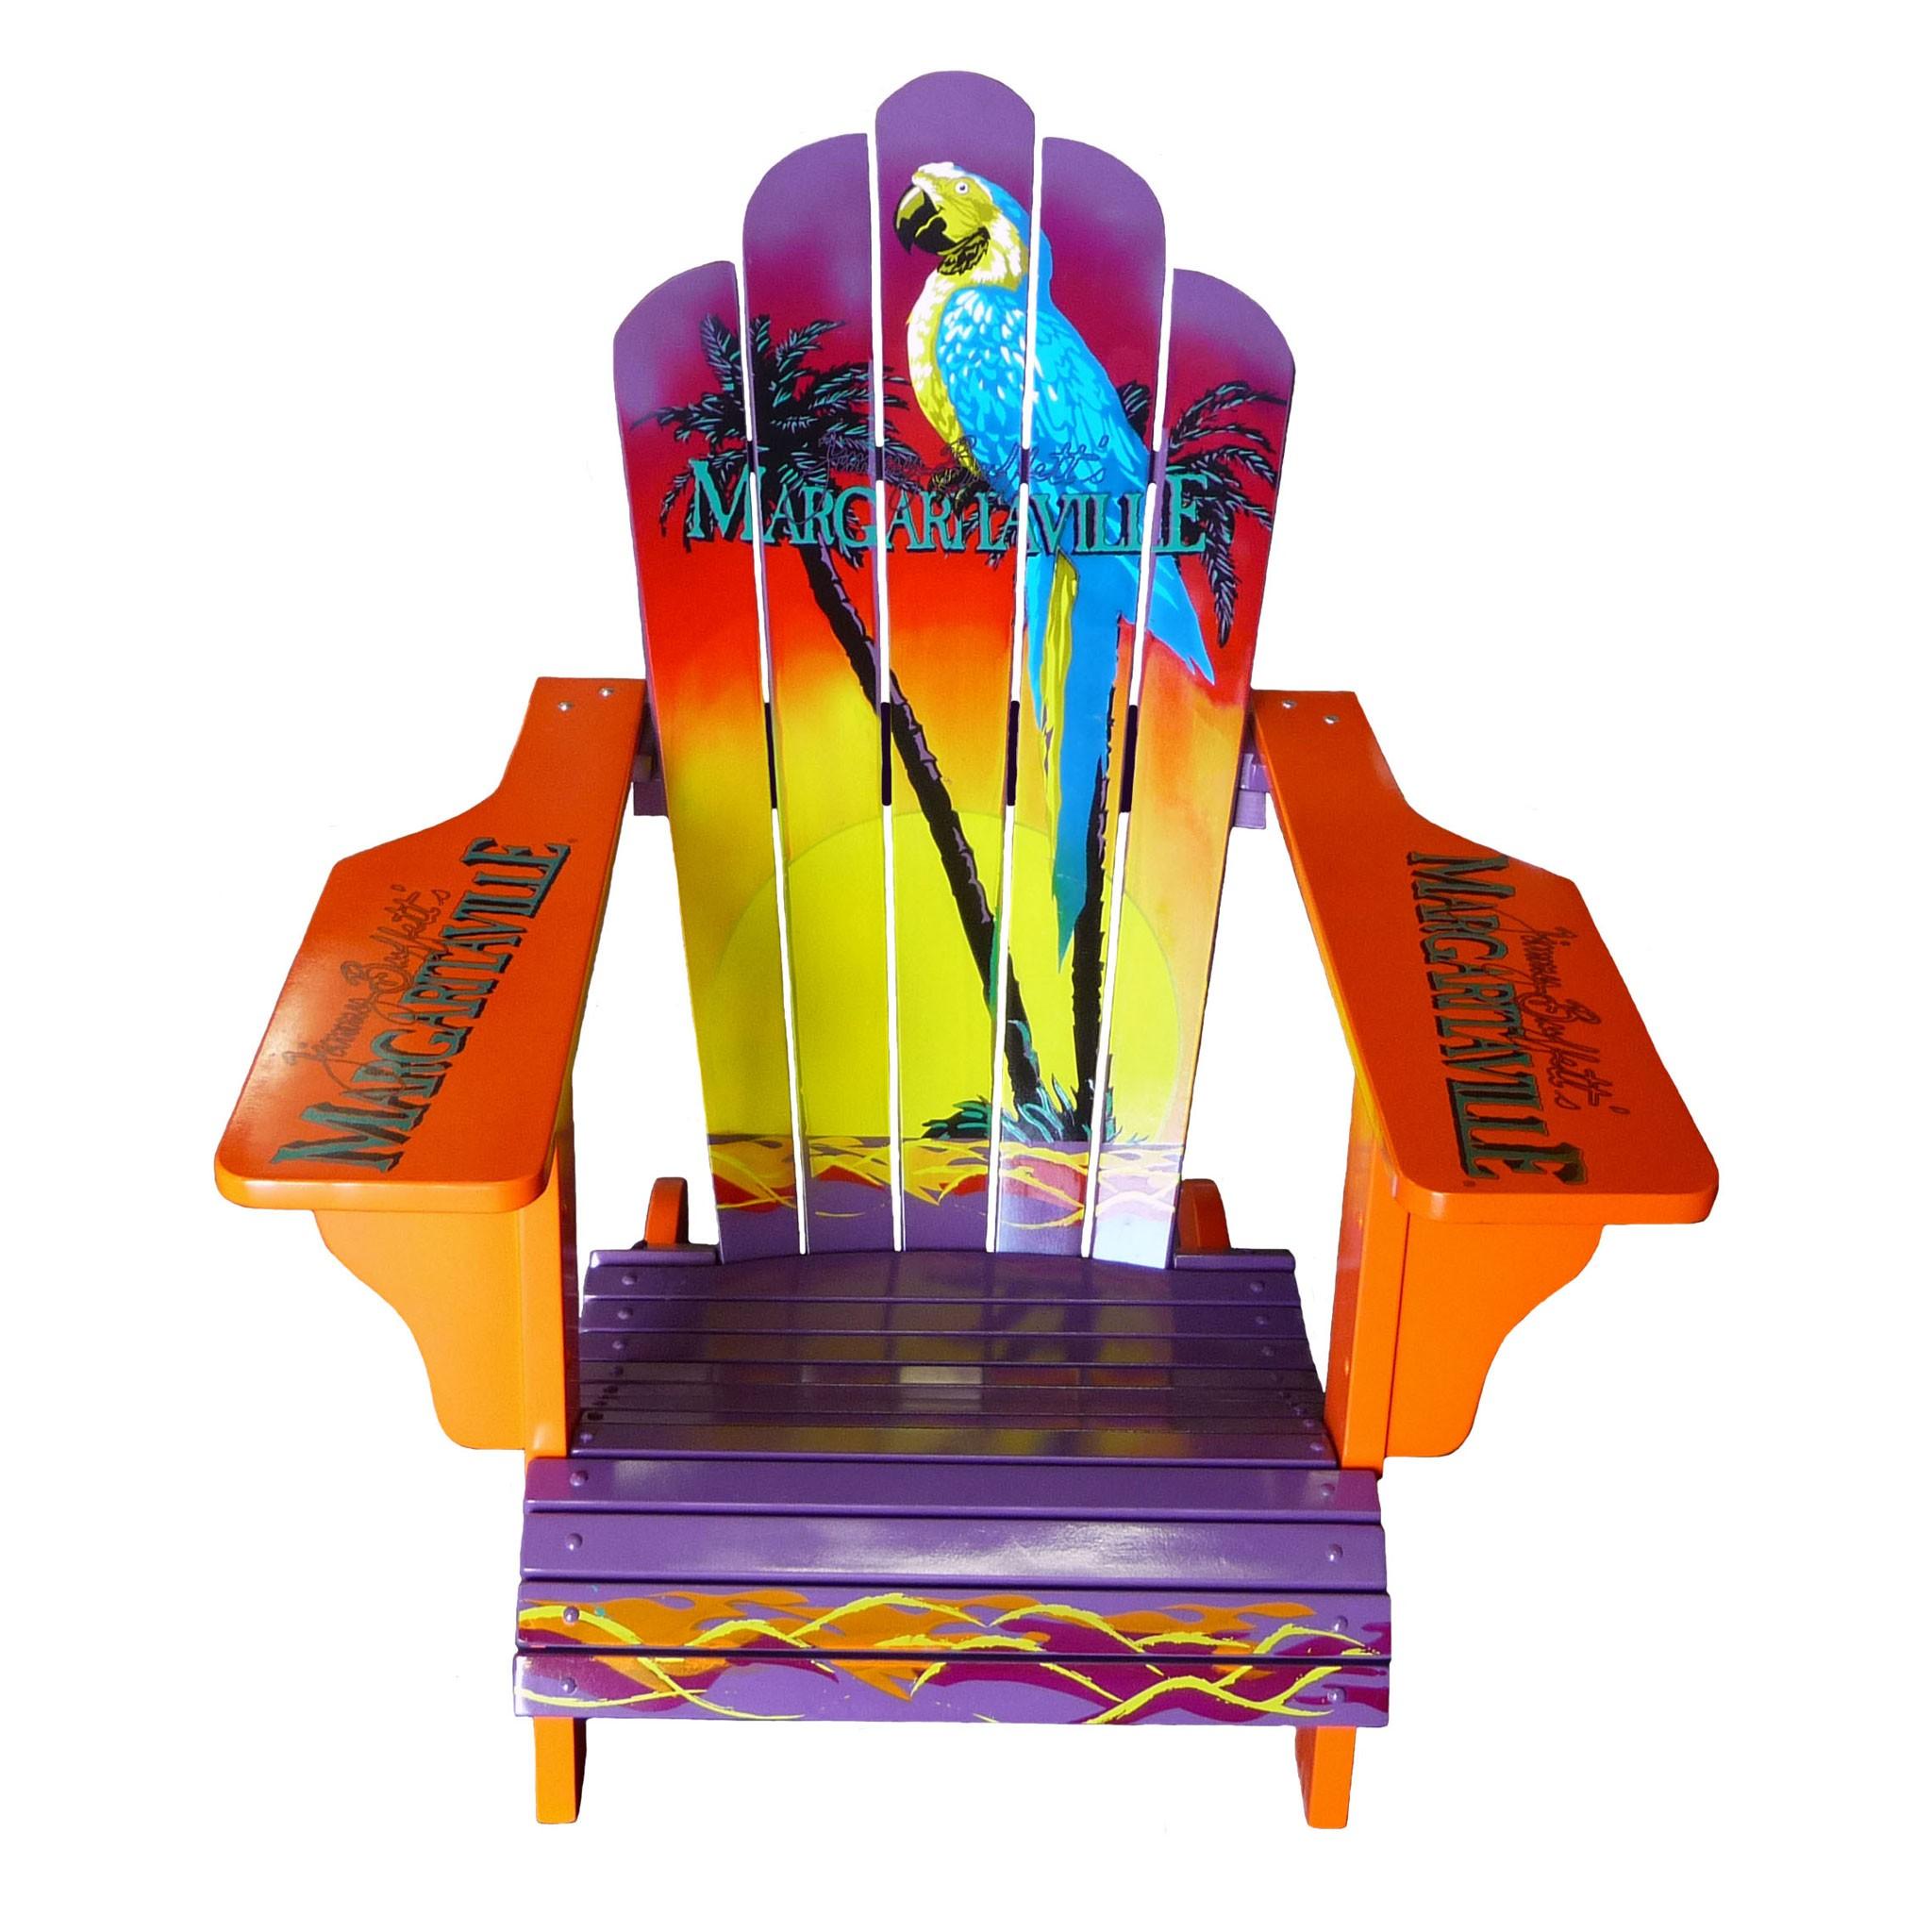 Margaritaville Chairs